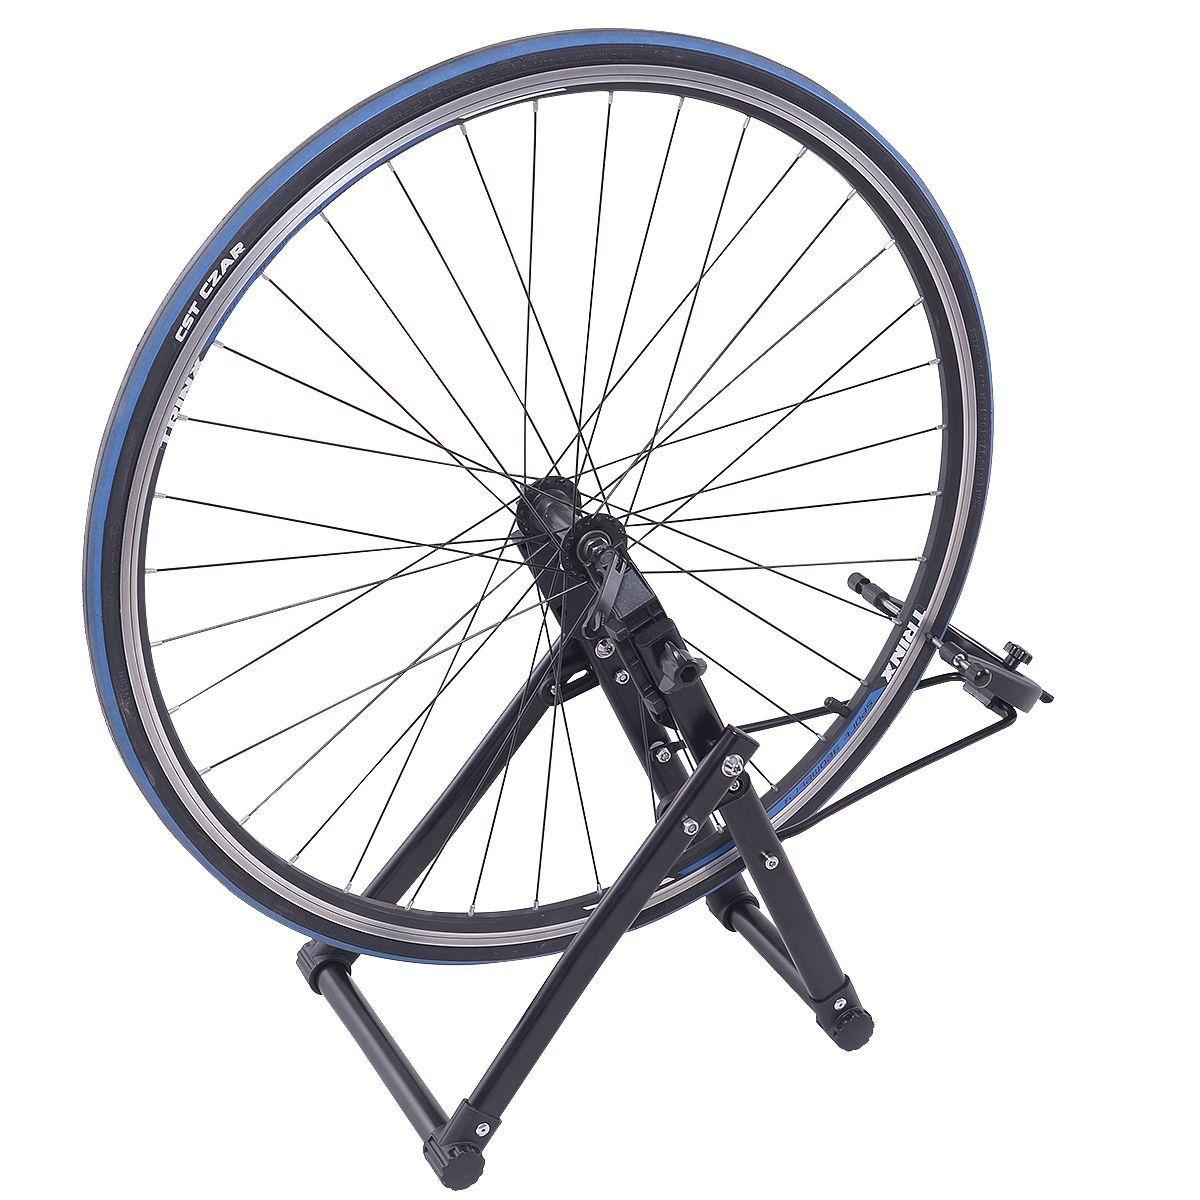 Goplus Professional Bike Wheel Truing Stand Bicycle Wheel